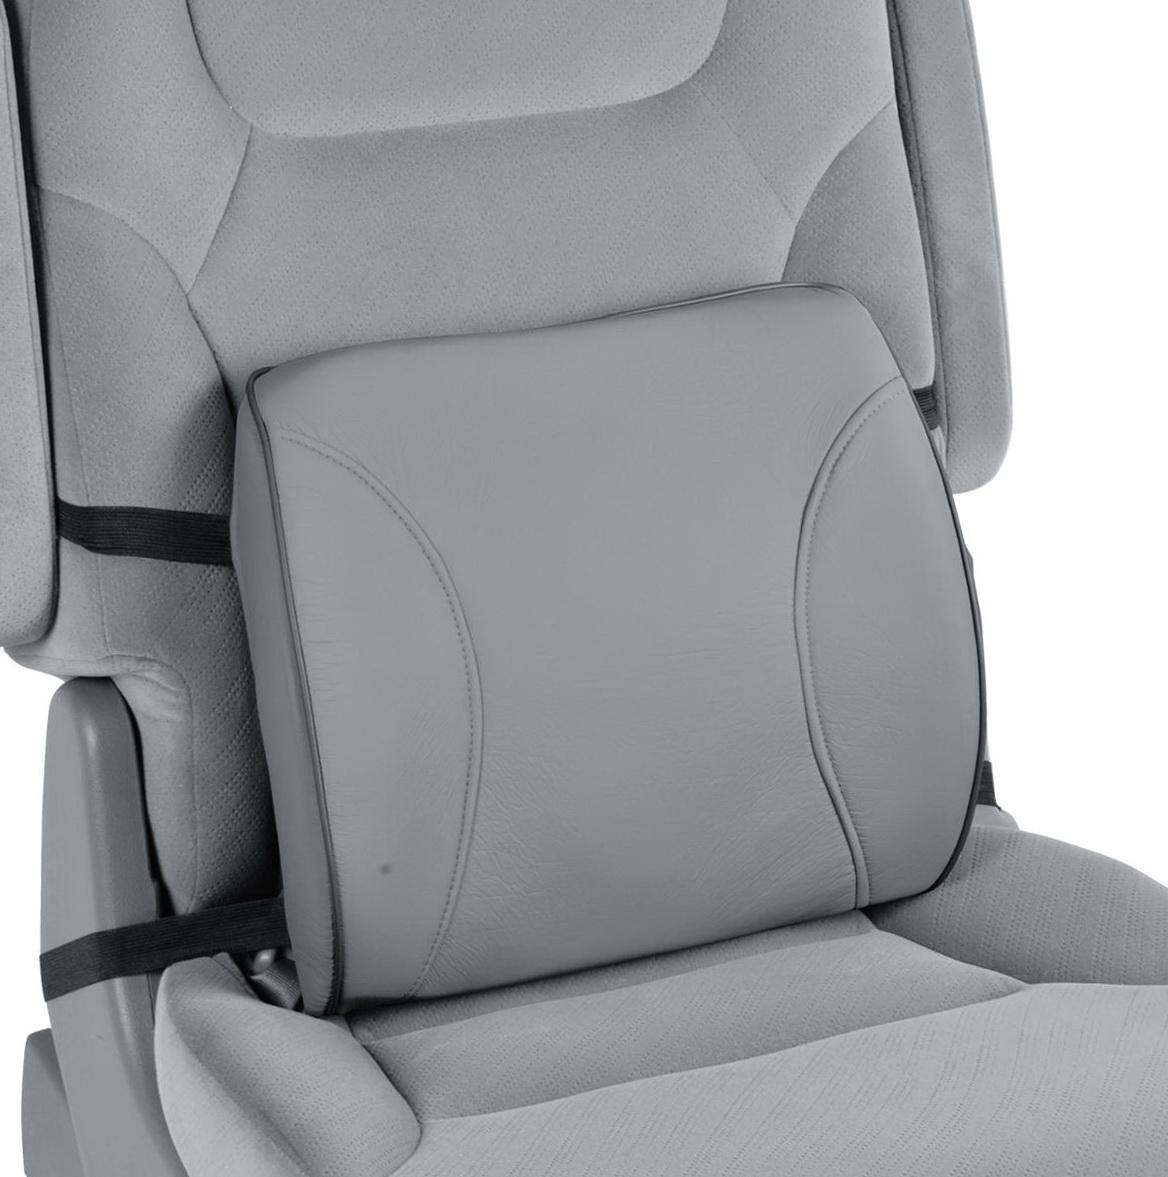 Car Seat Lumbar Support Cushion